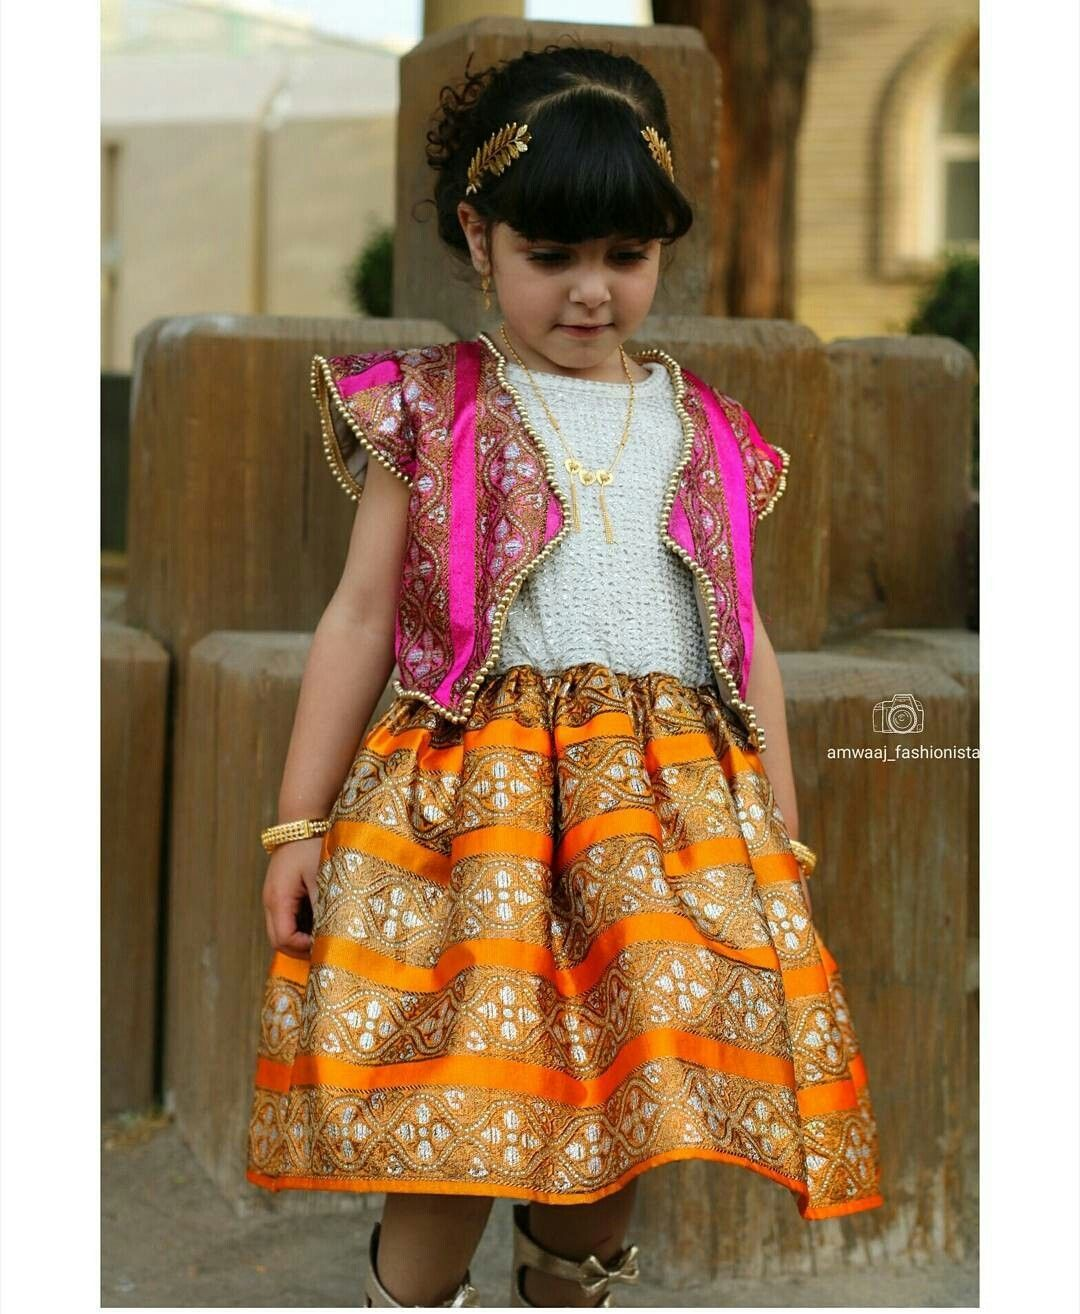 Pin By Zahra22 On قرقيعان Modest Girls Dresses Afghan Dresses Modest Dresses